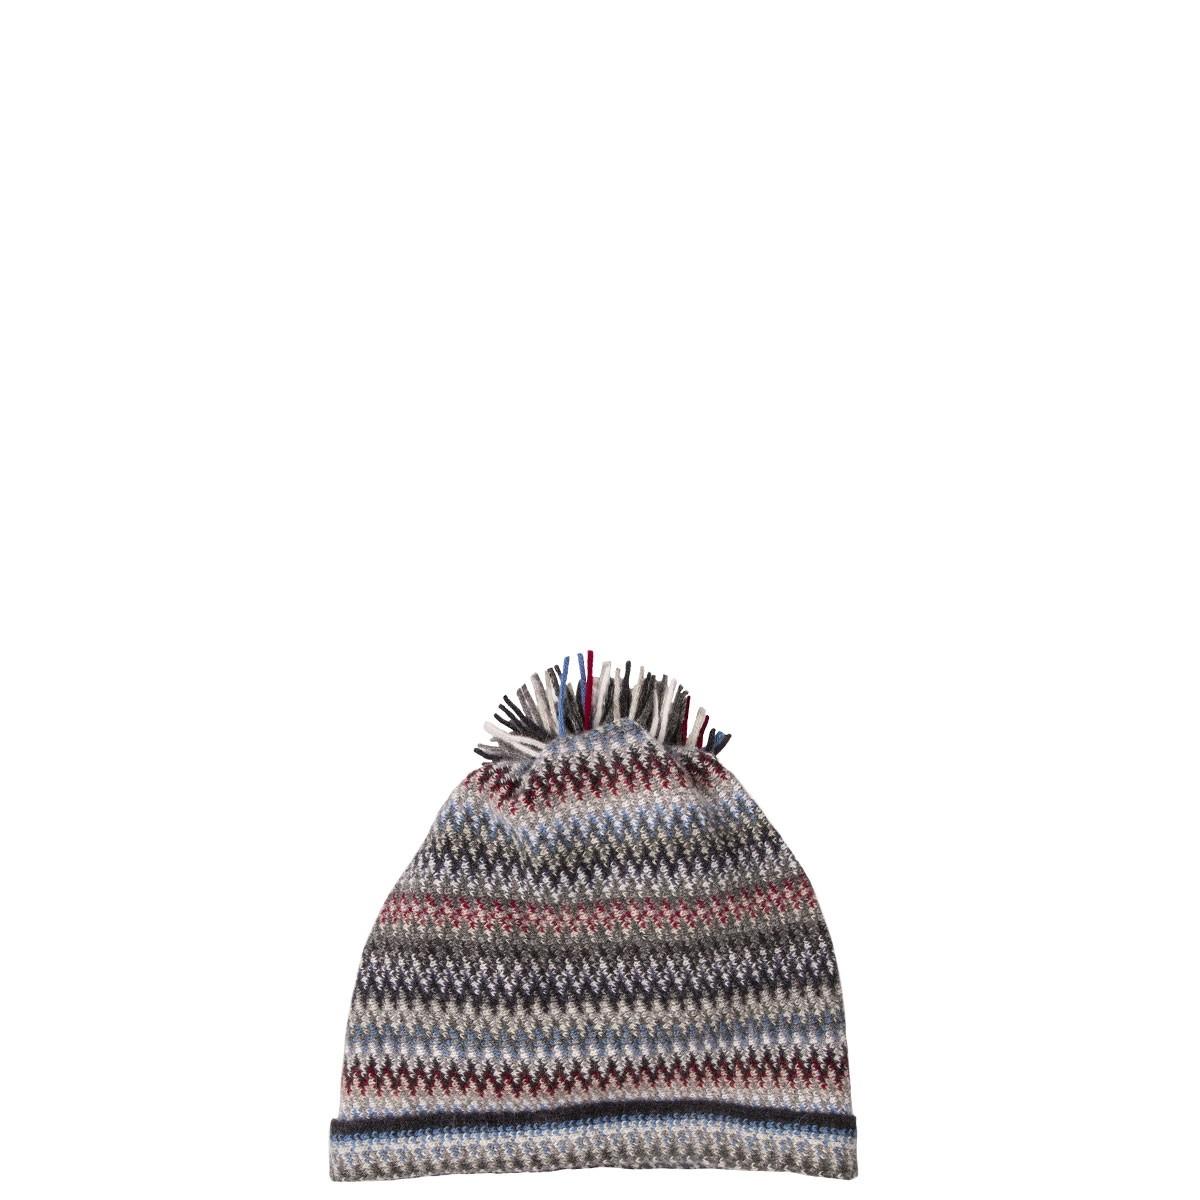 Arctic Faith Wool/Angora Knitted Hat